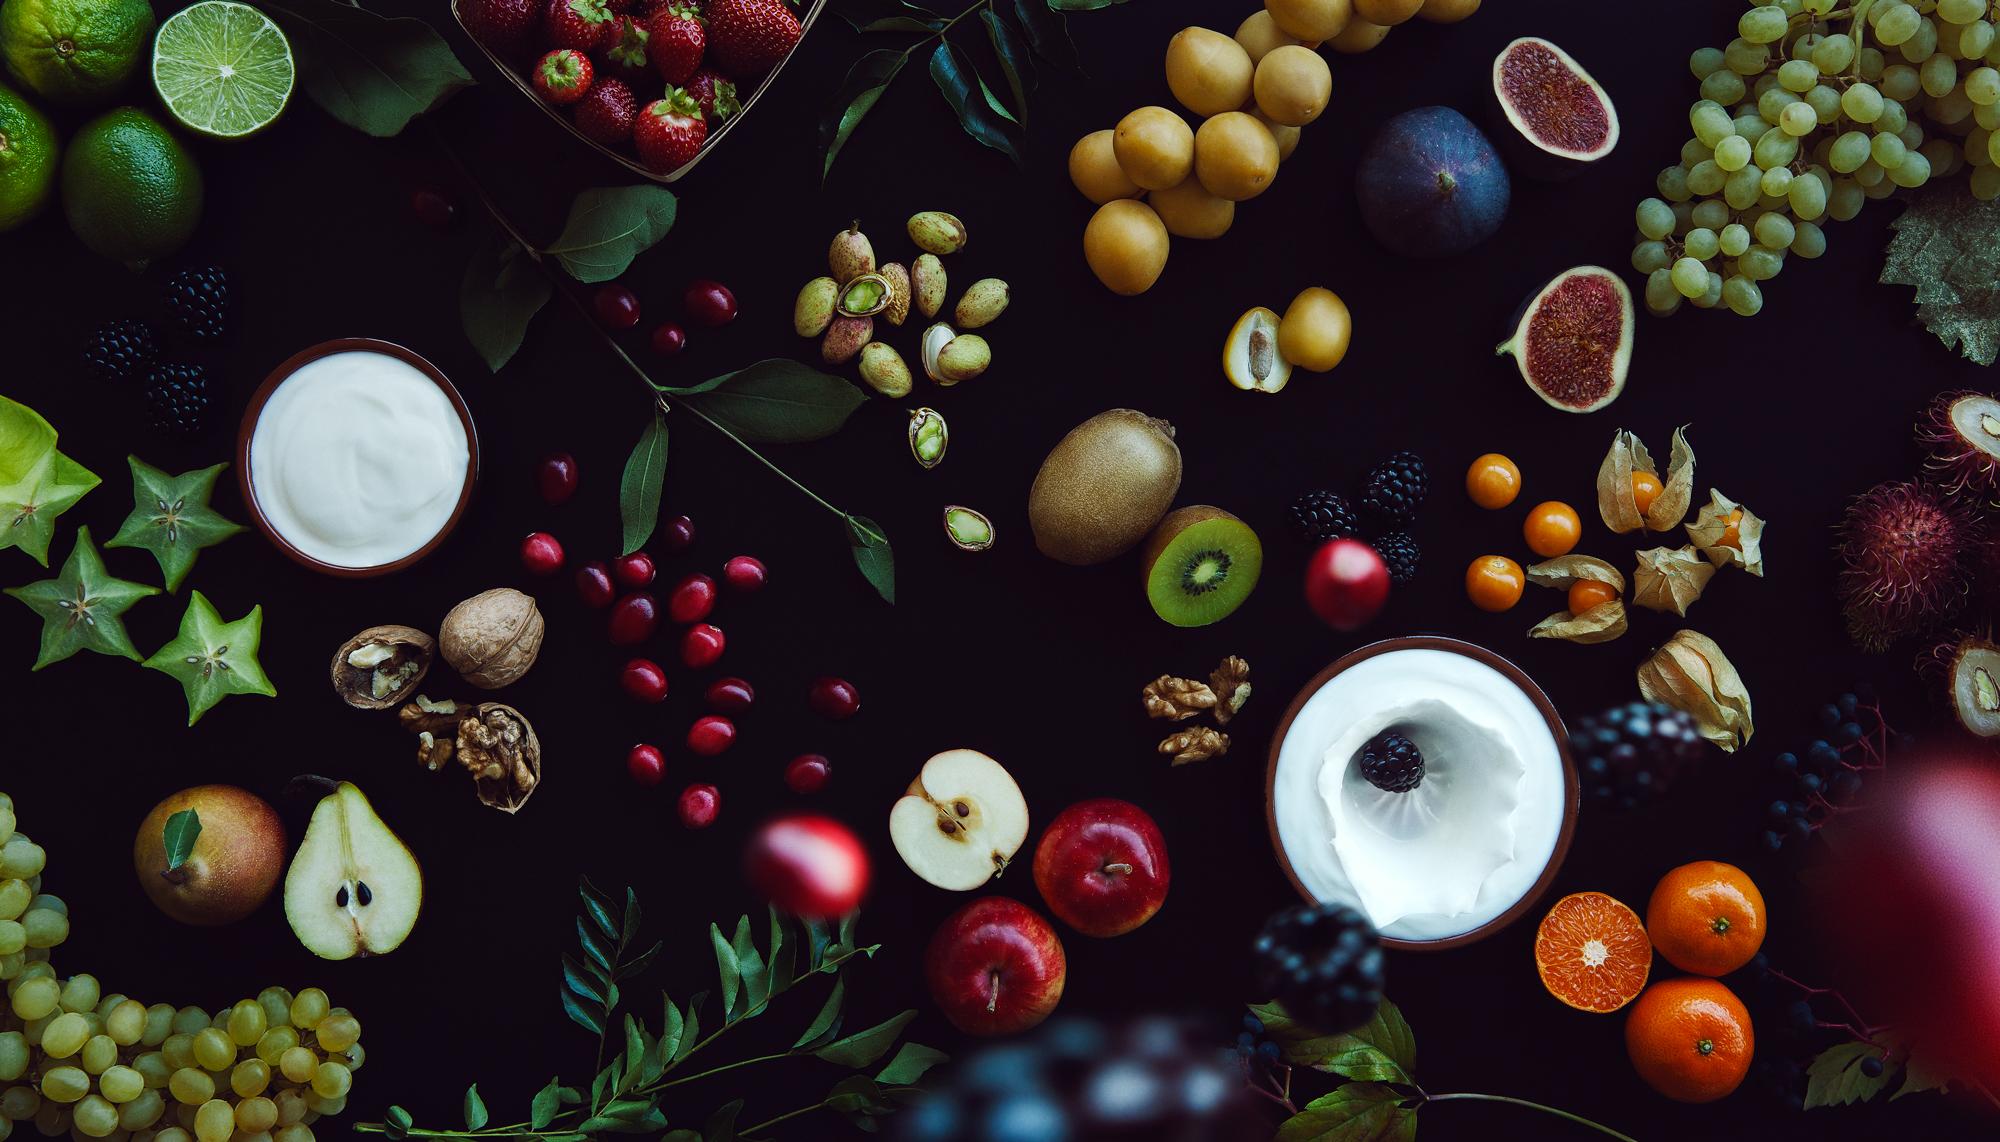 Topshot_Fruits_v3.jpg